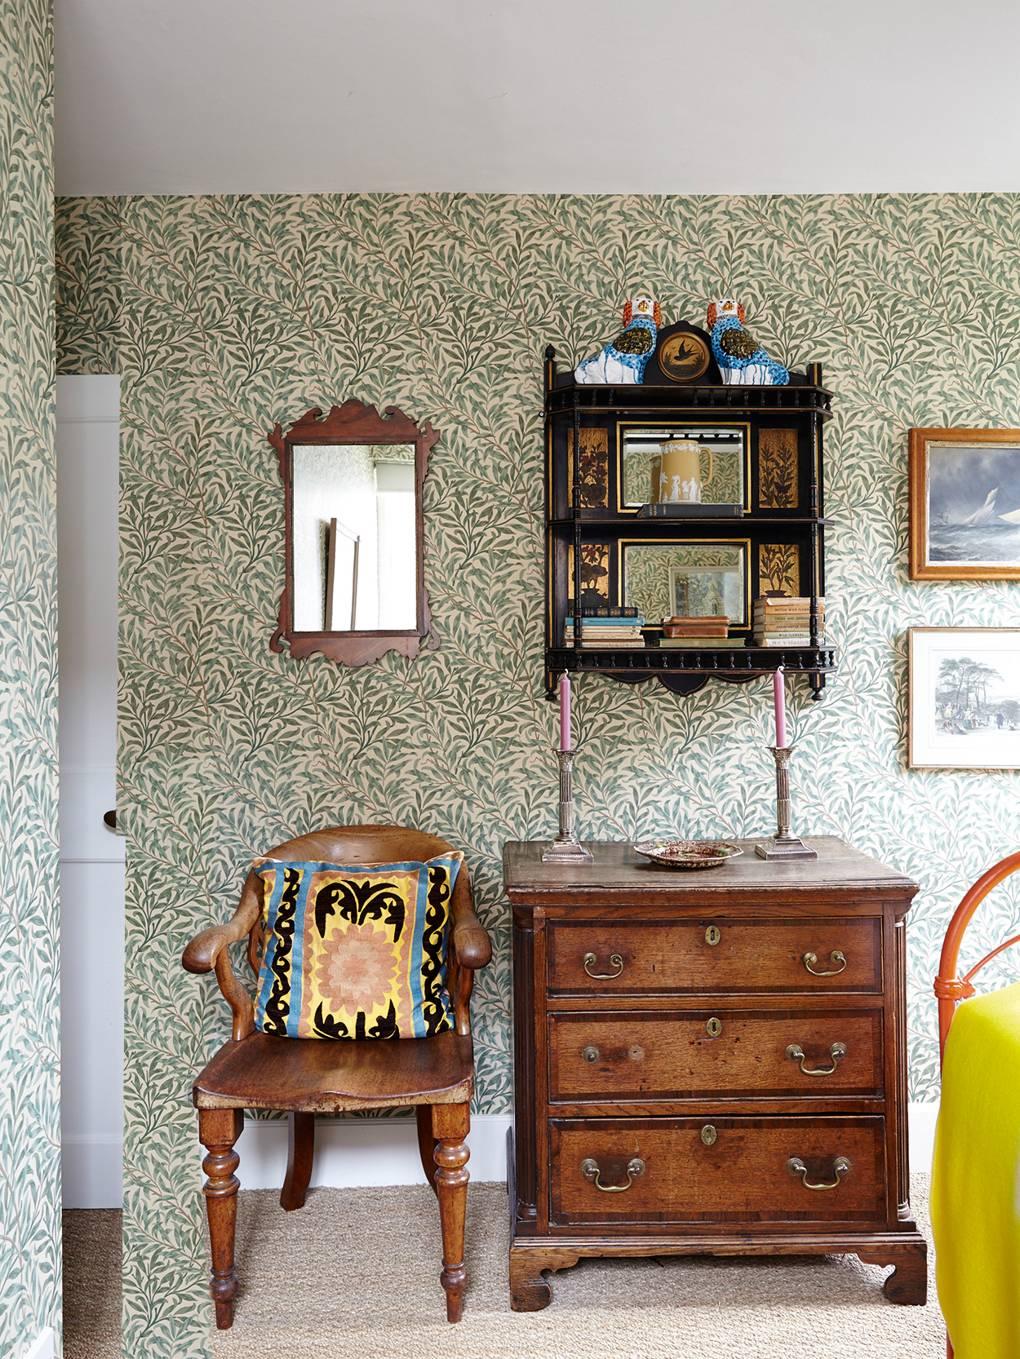 How To Do An Arts Crafts Interior House Garden,Home Decorative Craft Ideas